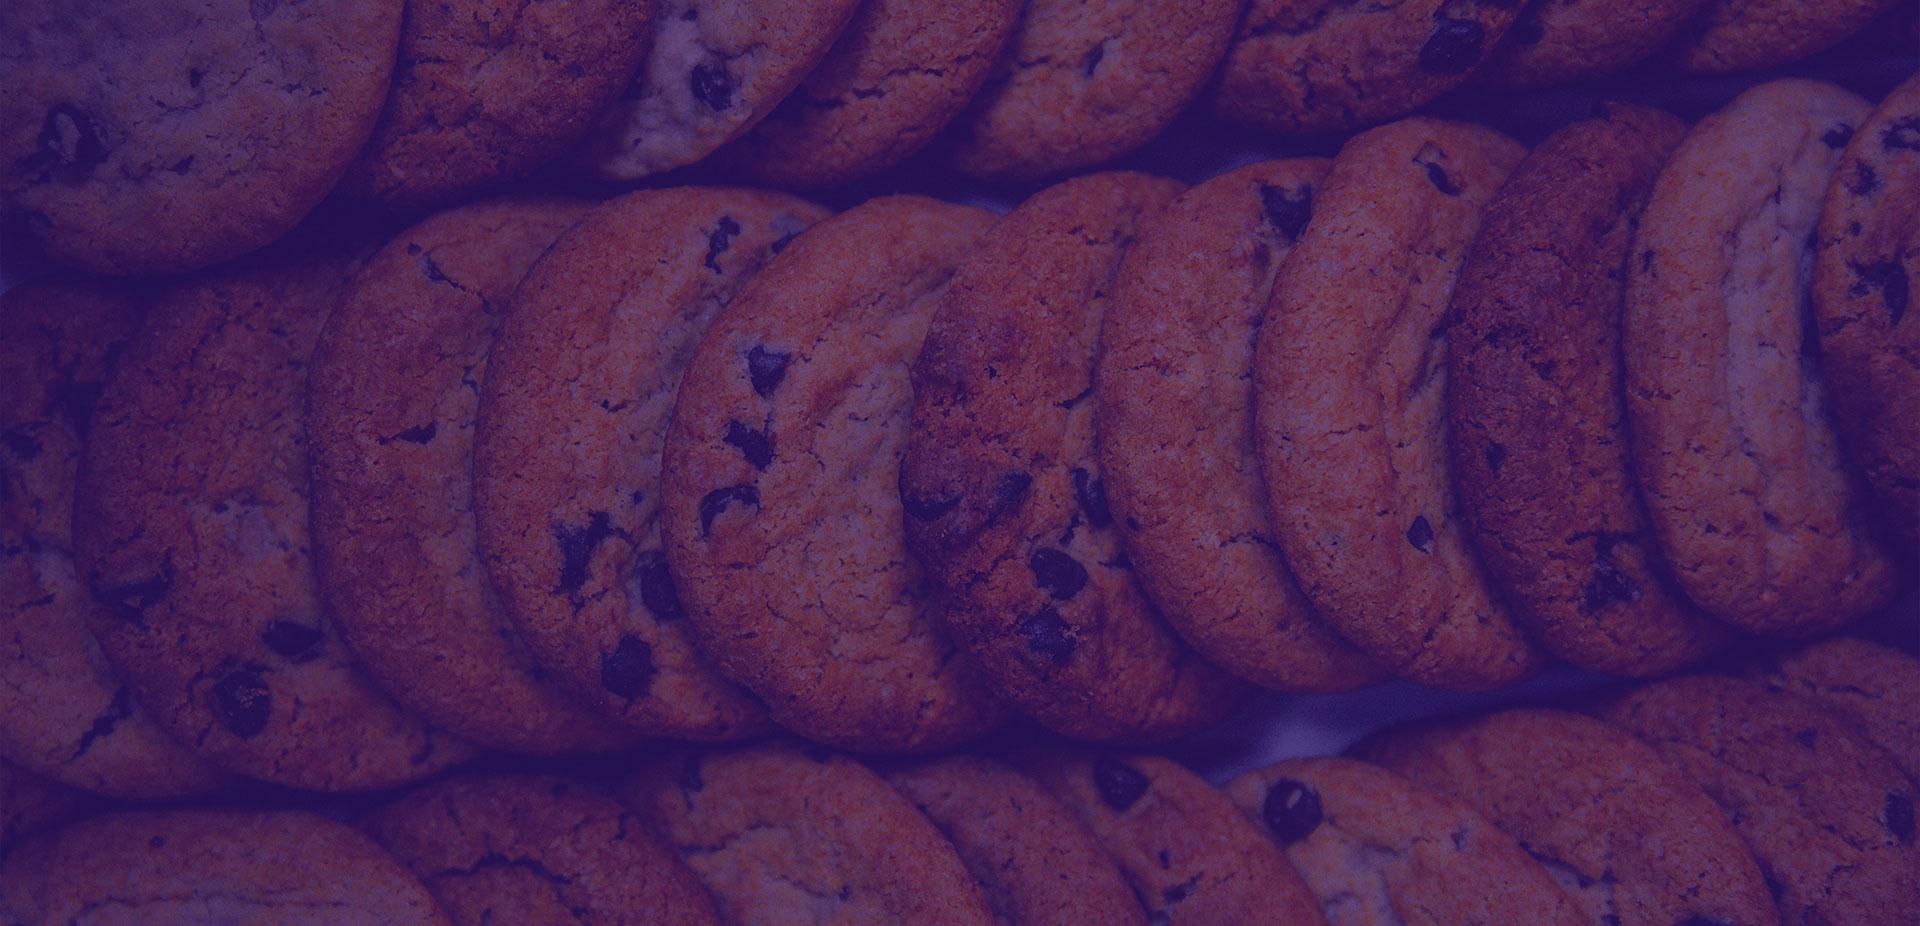 снимка на корица за полицата за бисквитки